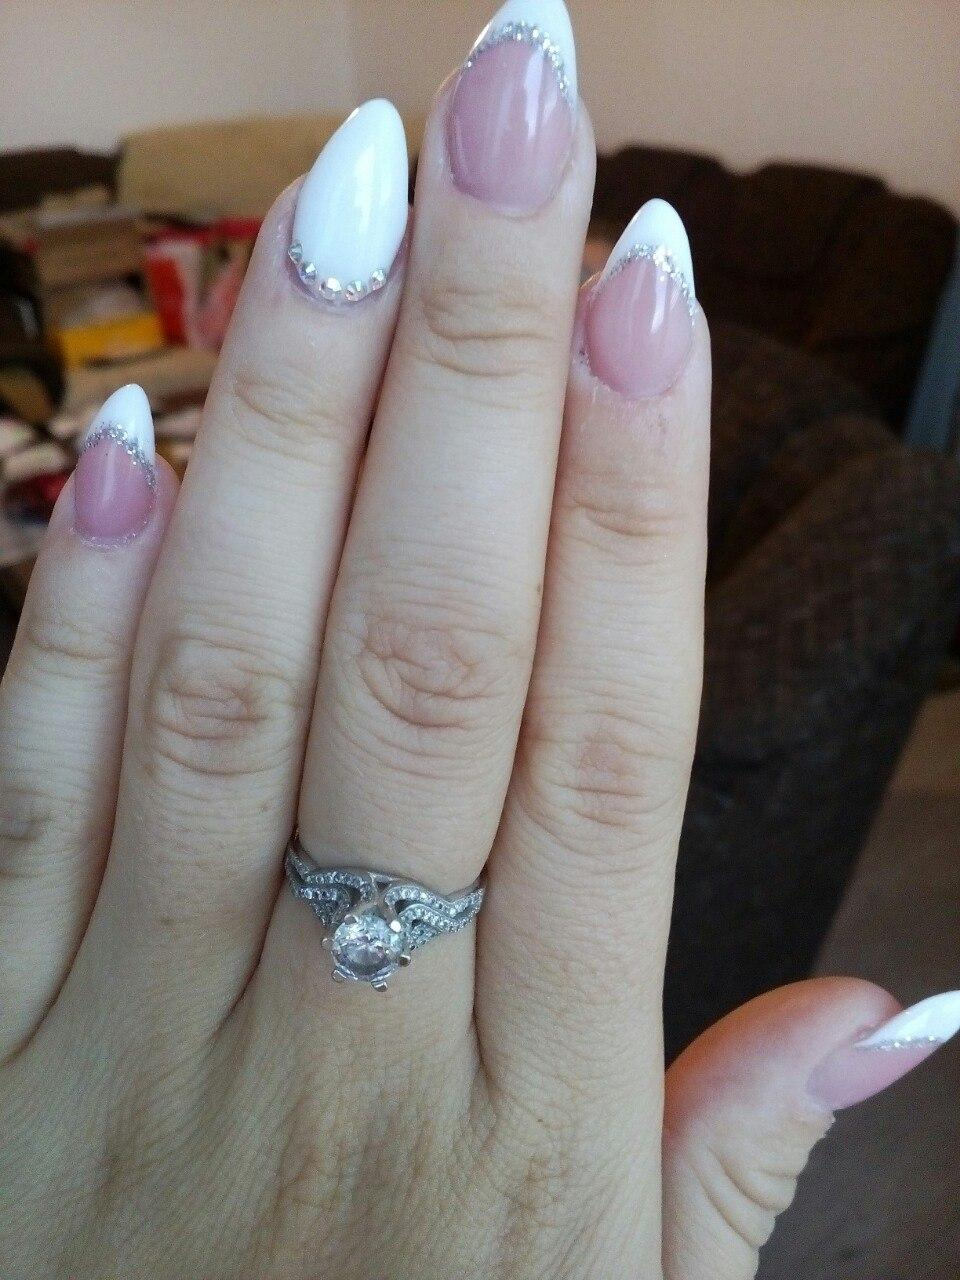 Svadobné manikúry neviest z MS - @catrina_so - Nechty: tvorba kamarátky